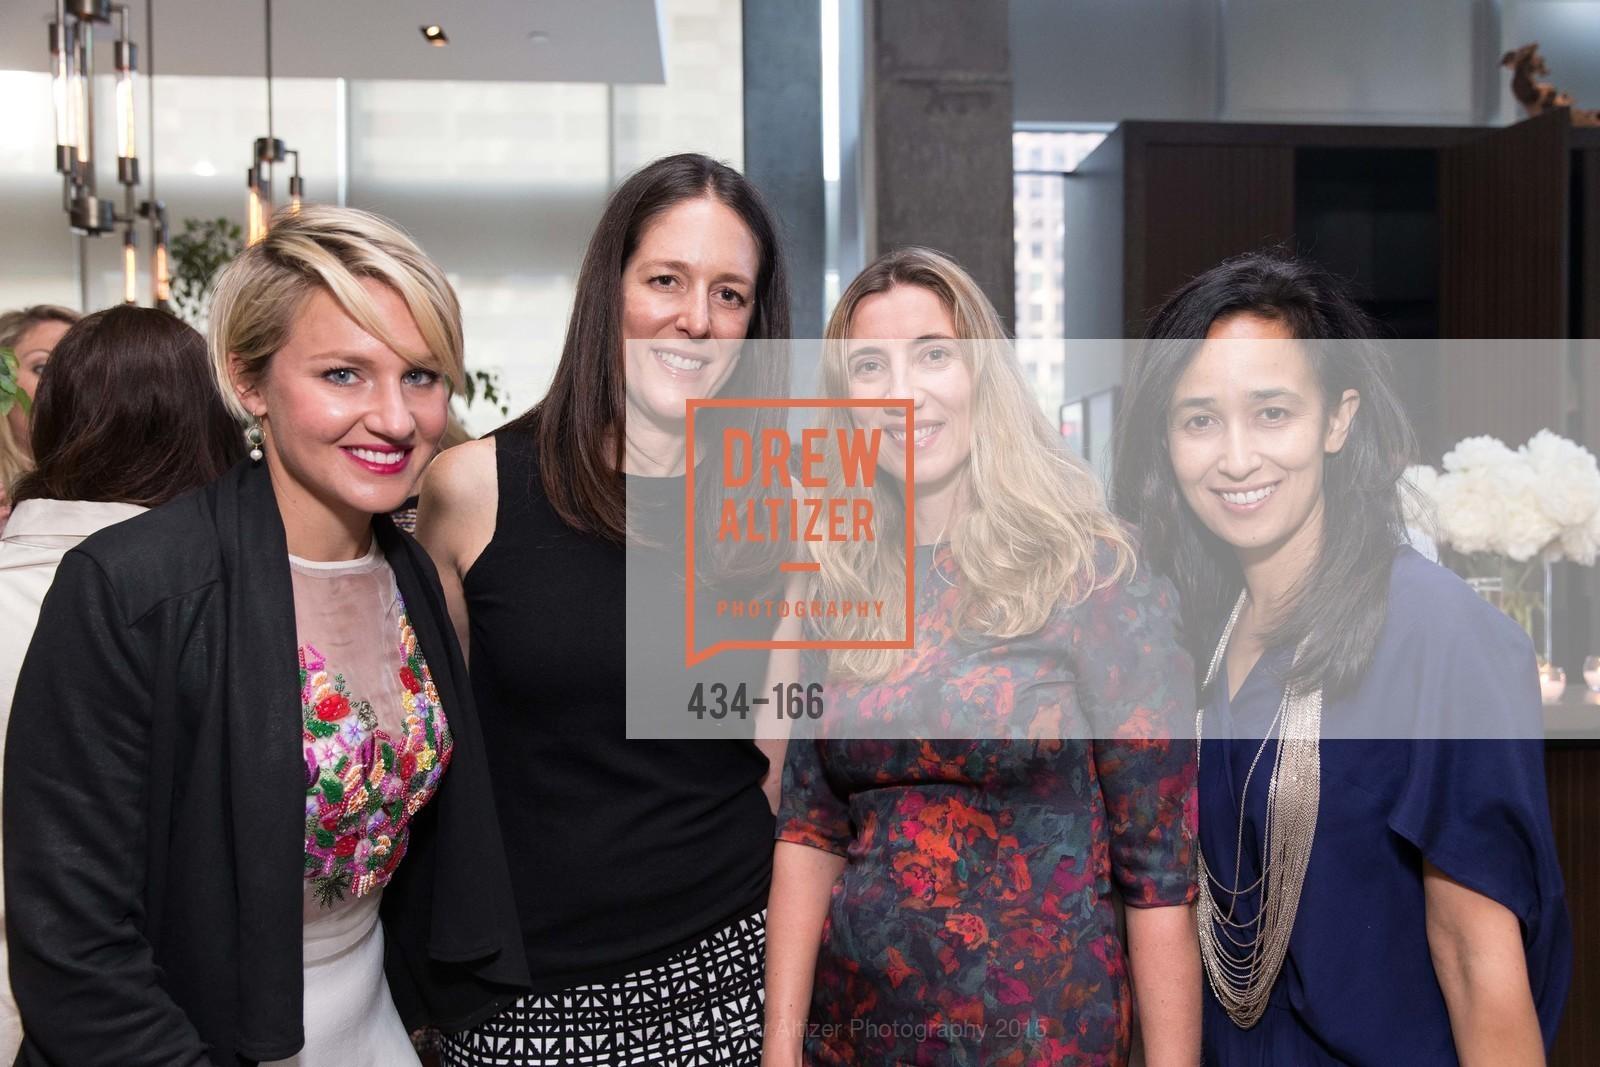 Maghan McDowell, Lisa Tarter, Shari Jones, Mariam Naficy, Elle Women in Tech, Prospect. 300 Spear Street, June 16th, 2015